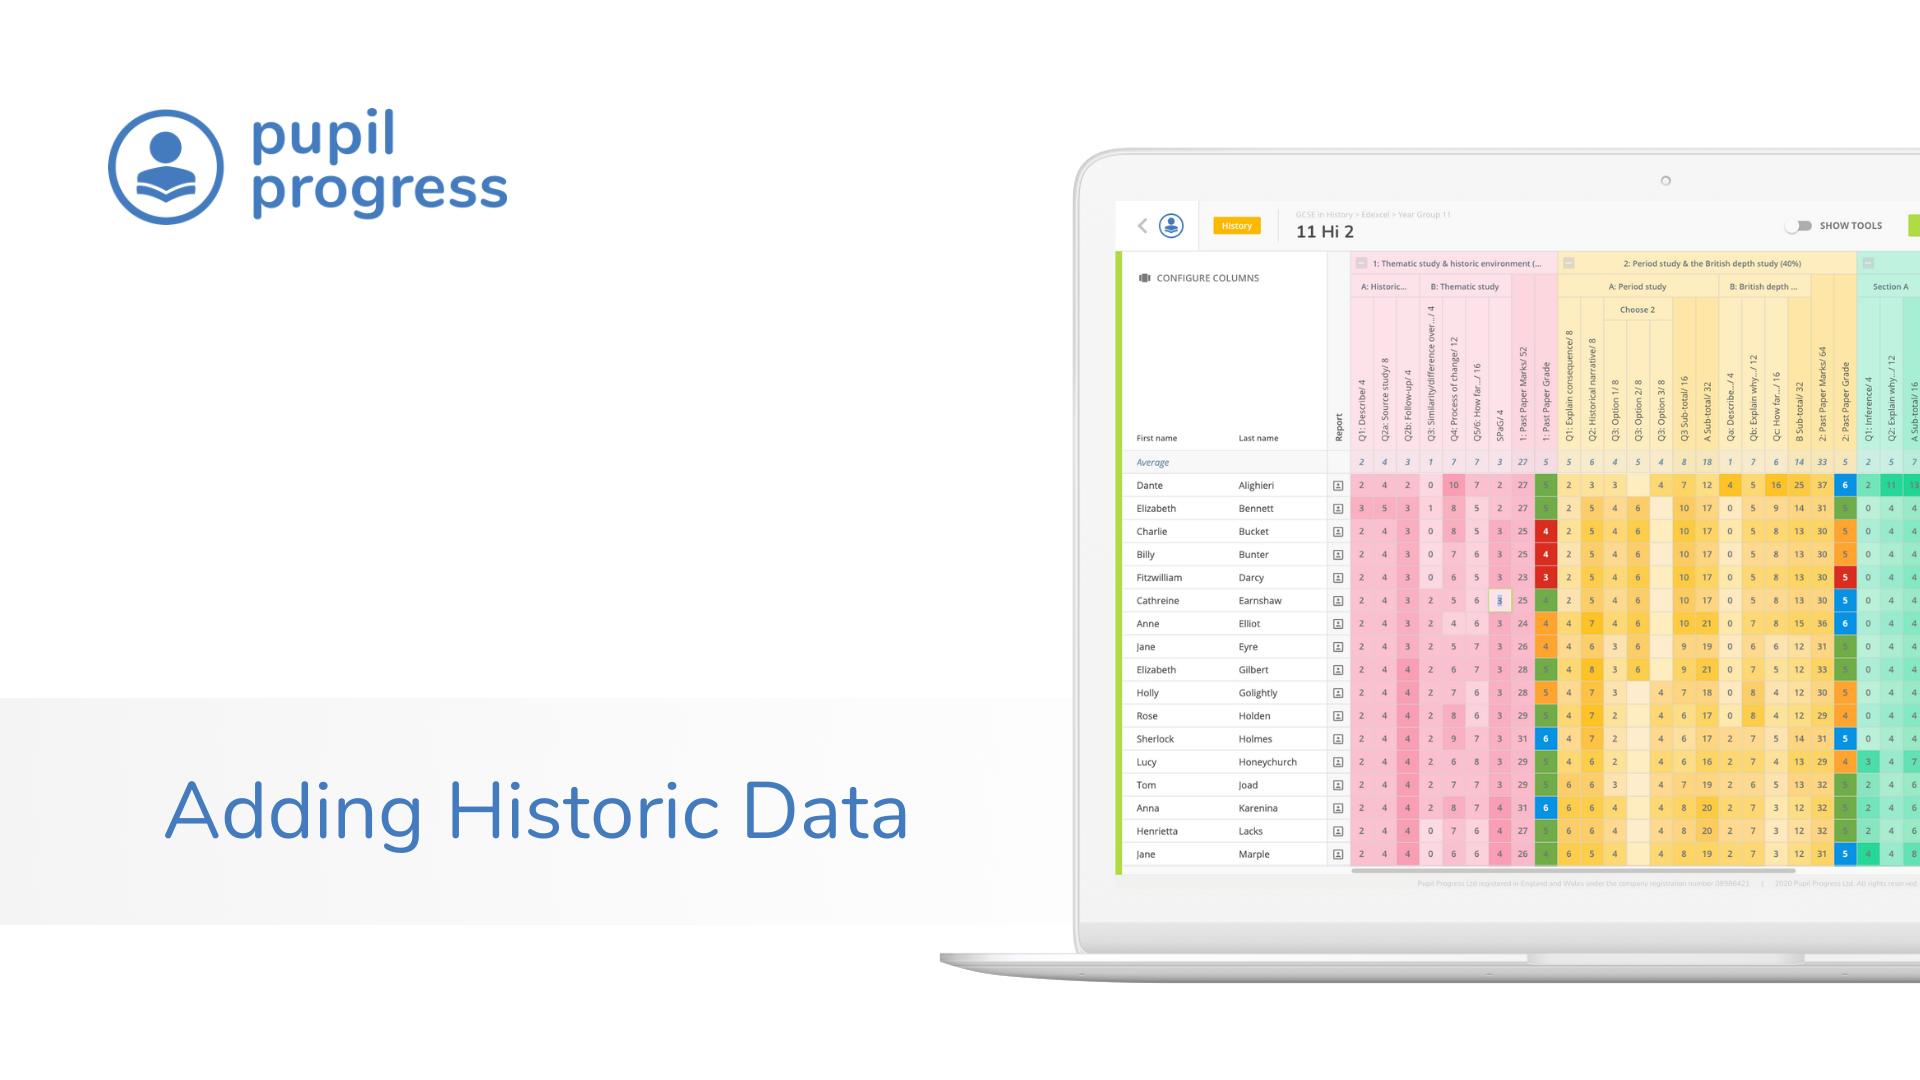 Adding Historic Data